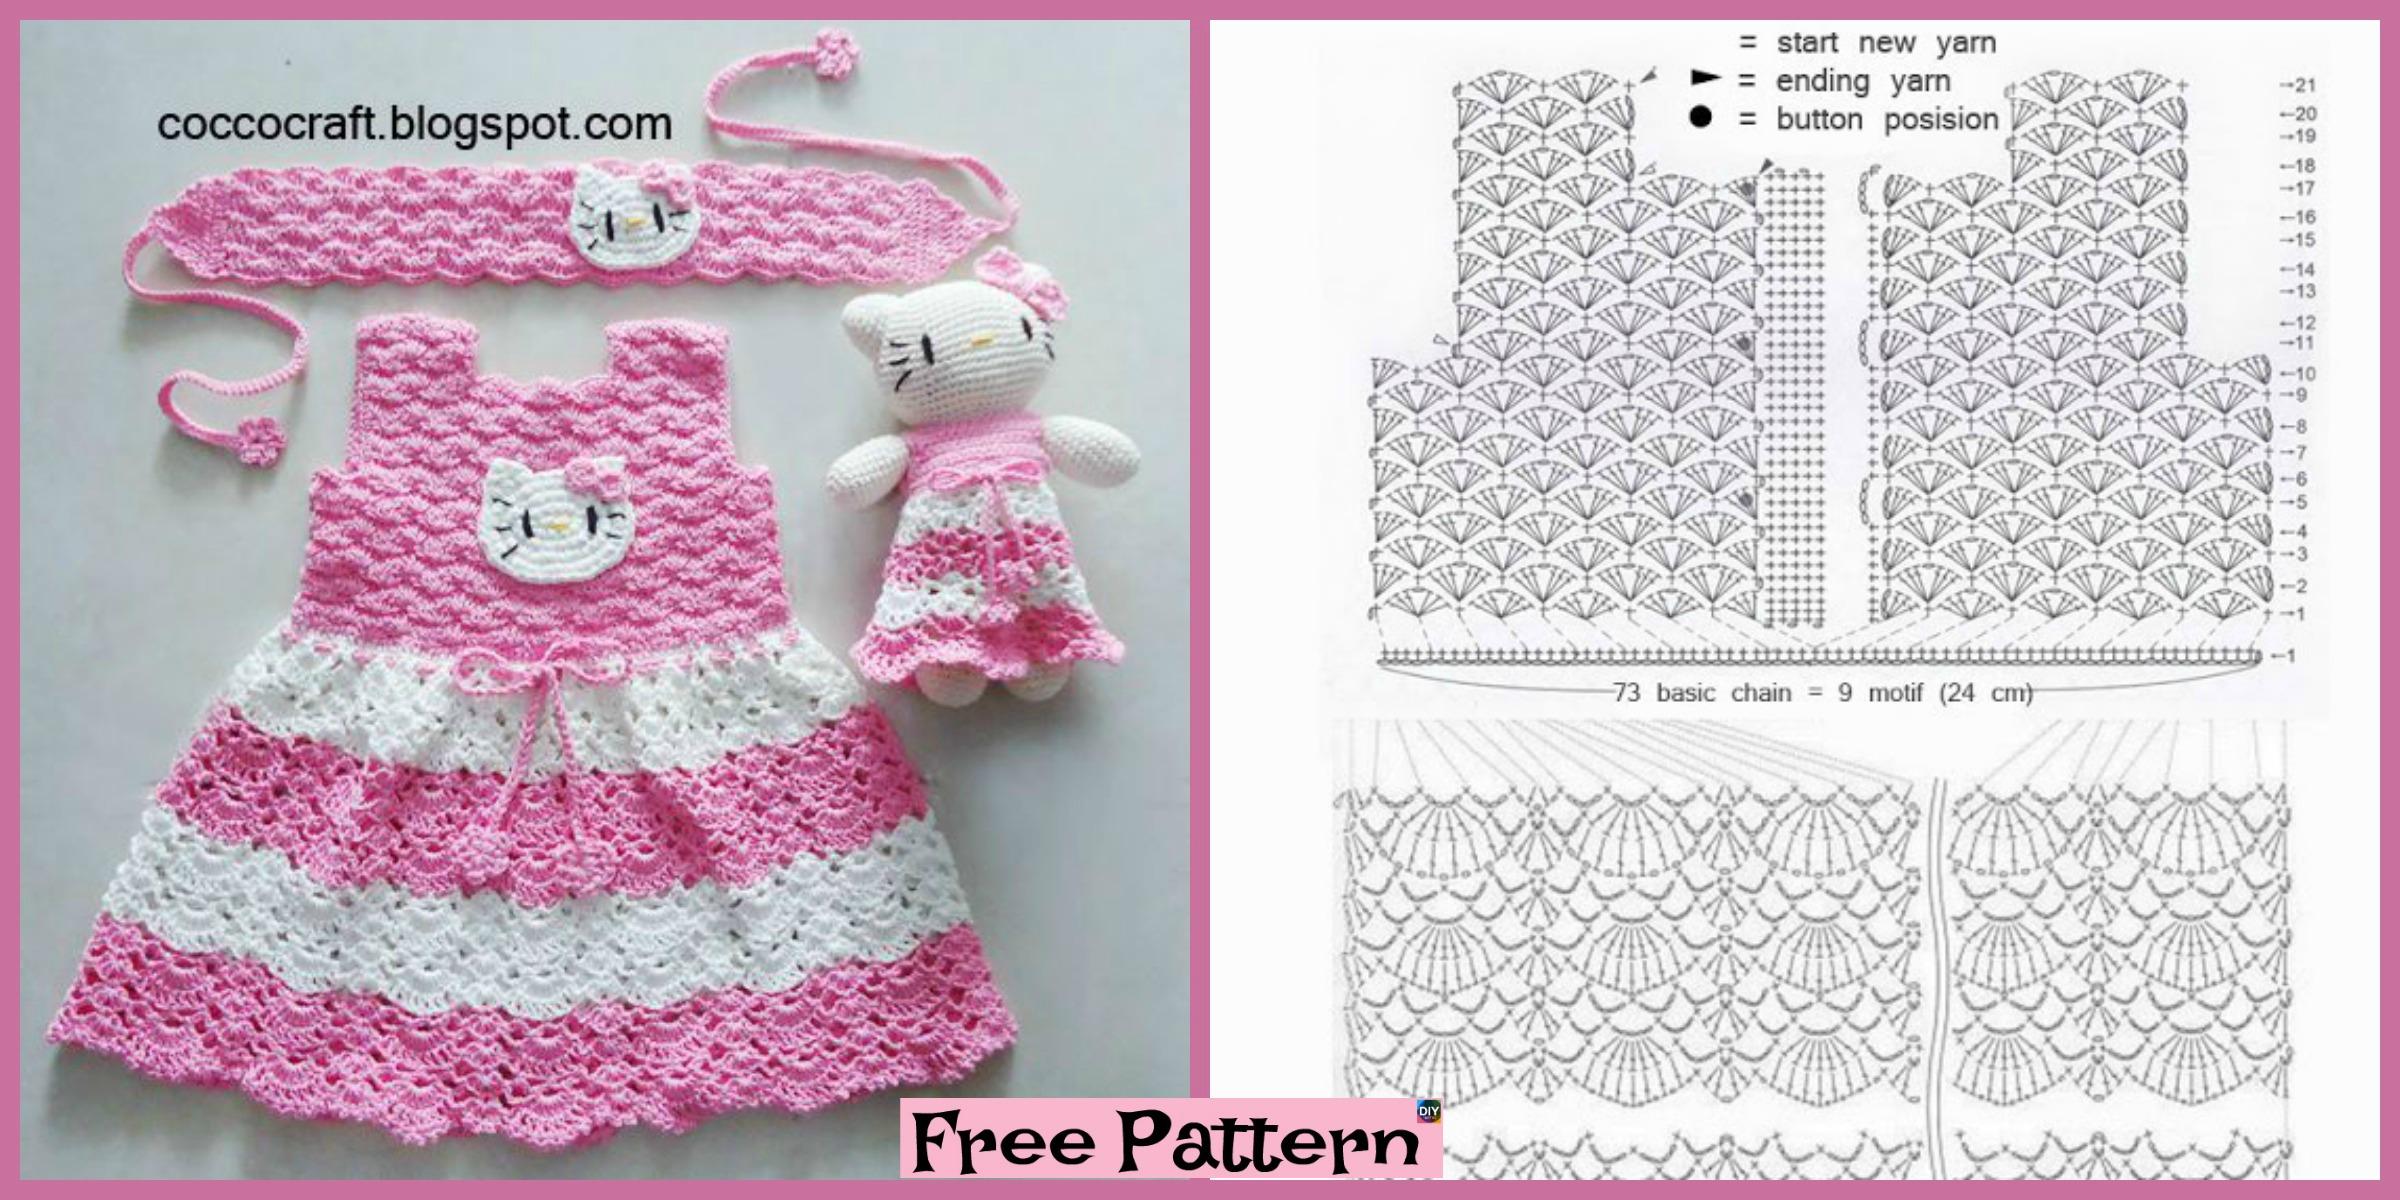 Crochet Hello Kitty Dress & Amigurumi - Free Pattern - DIY 4 EVER